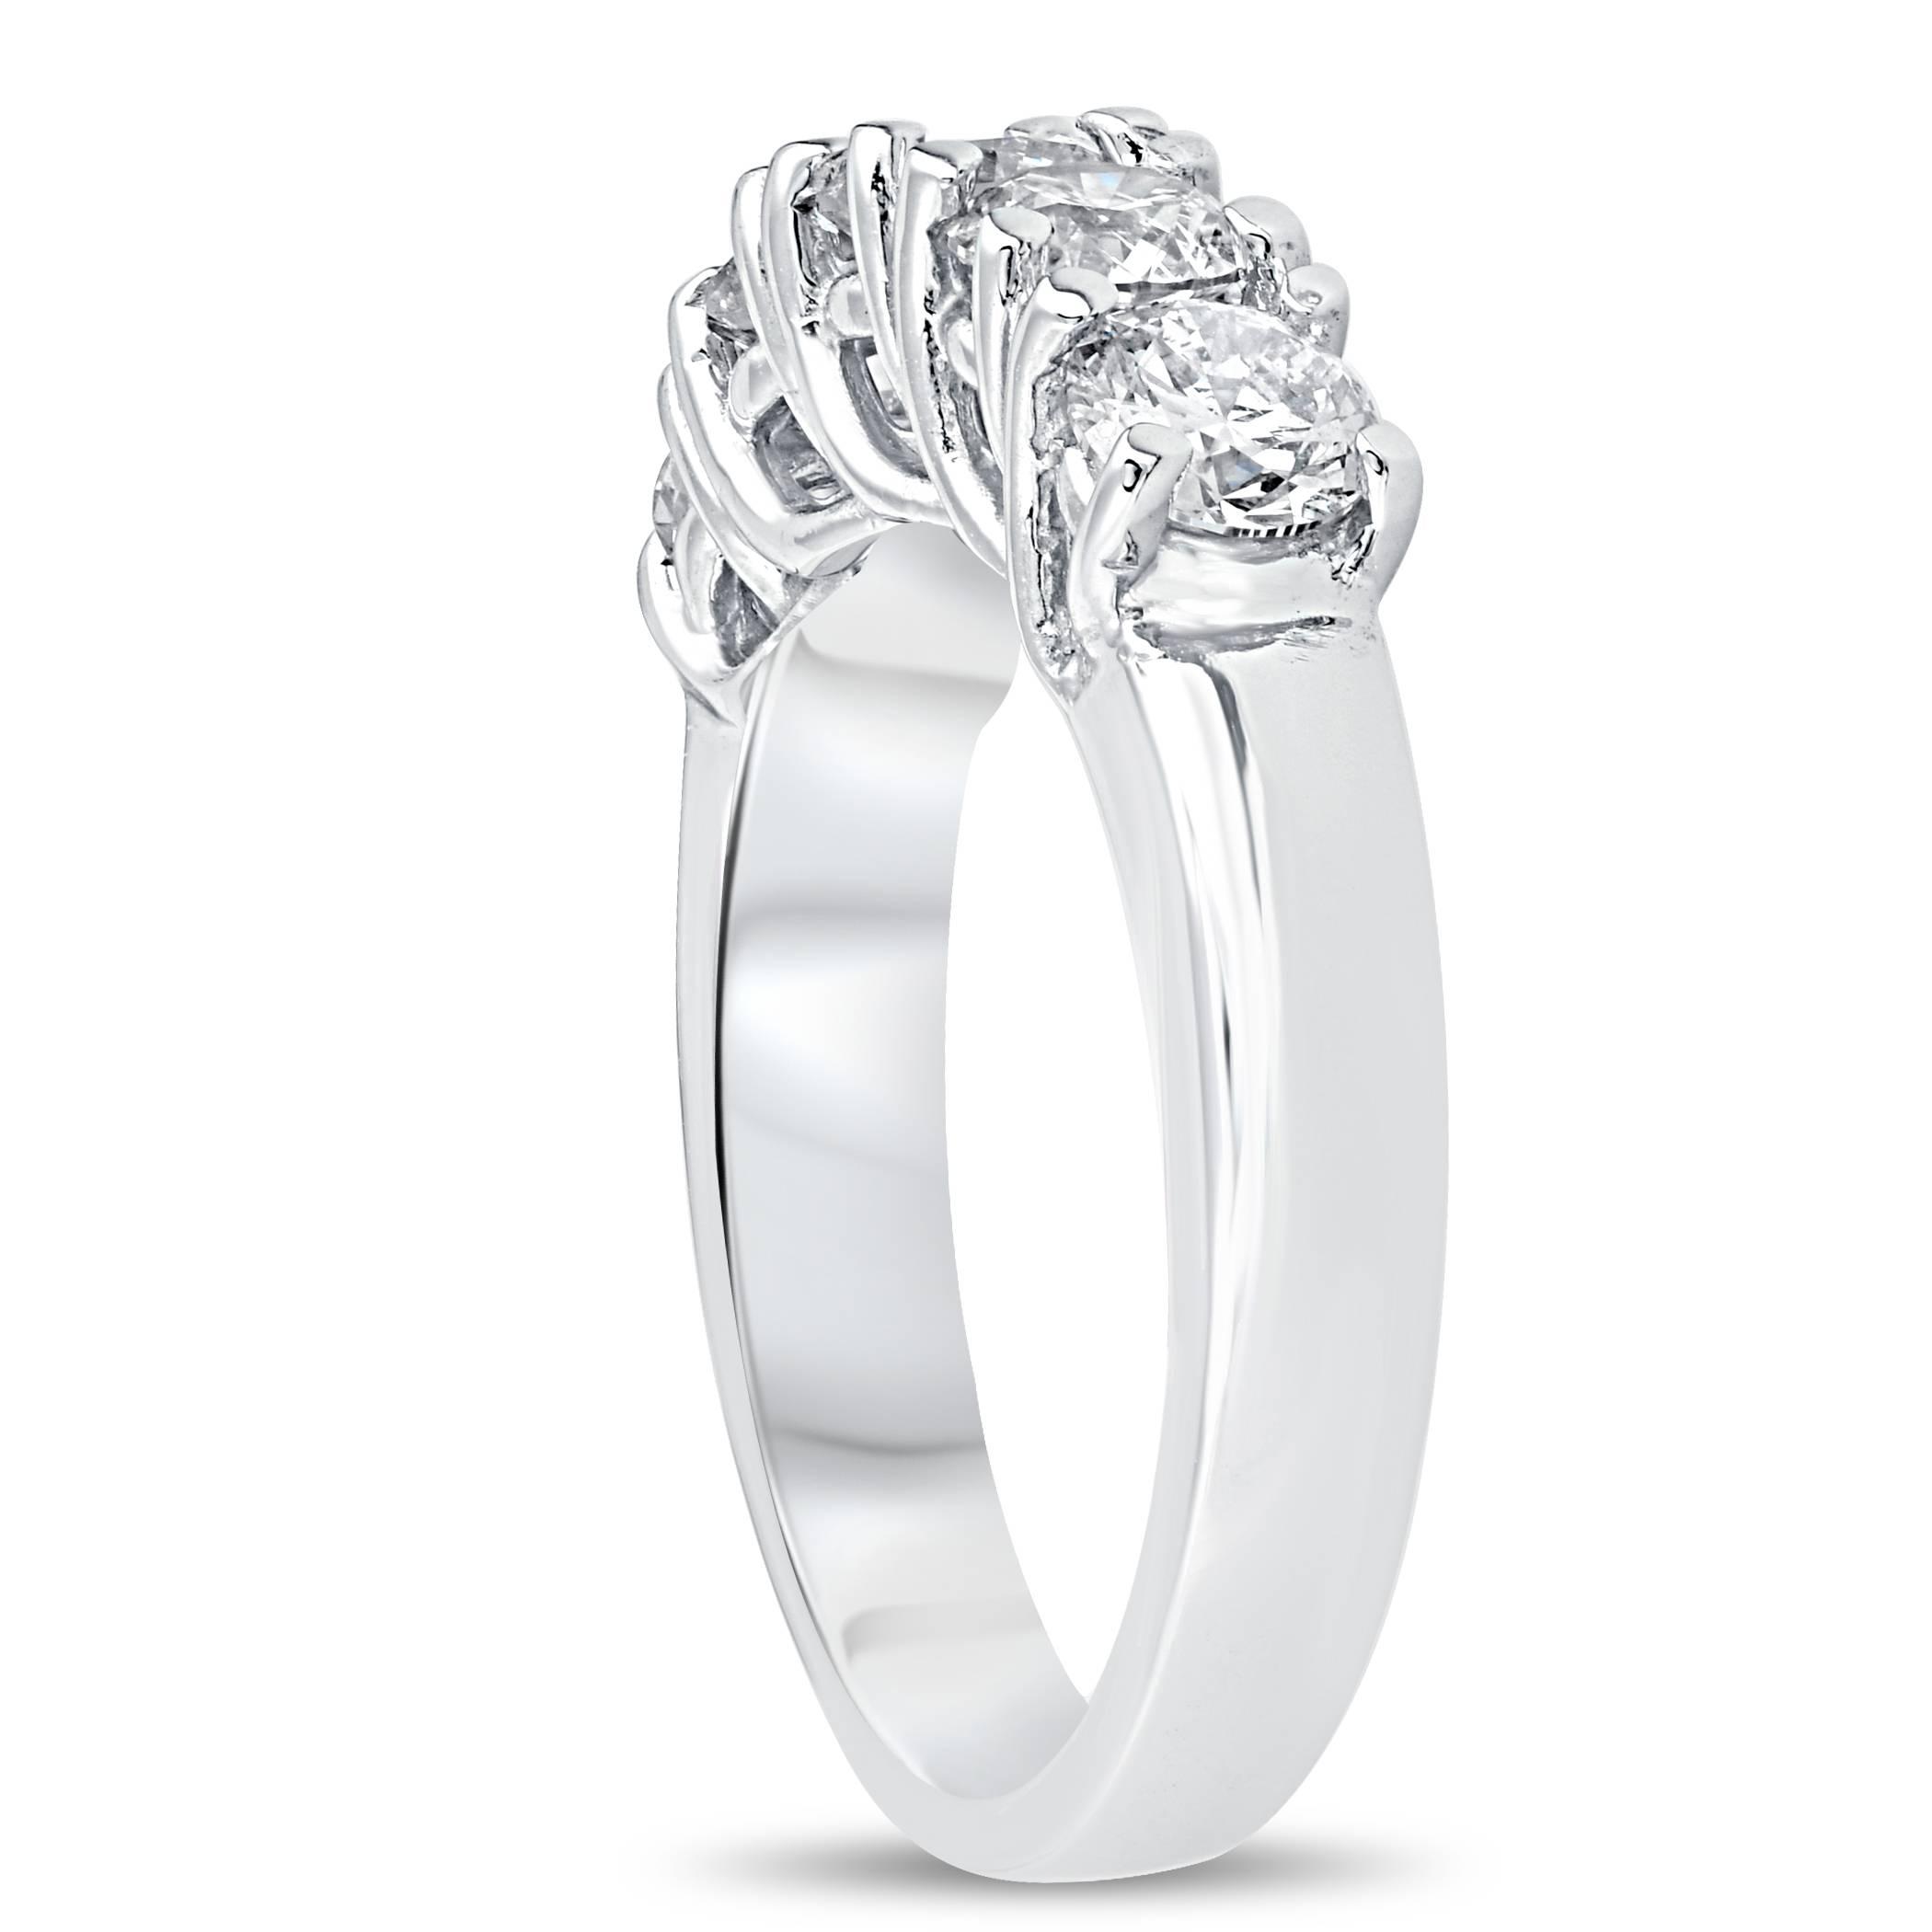 Ct real diamond wedding anniversary band womens k